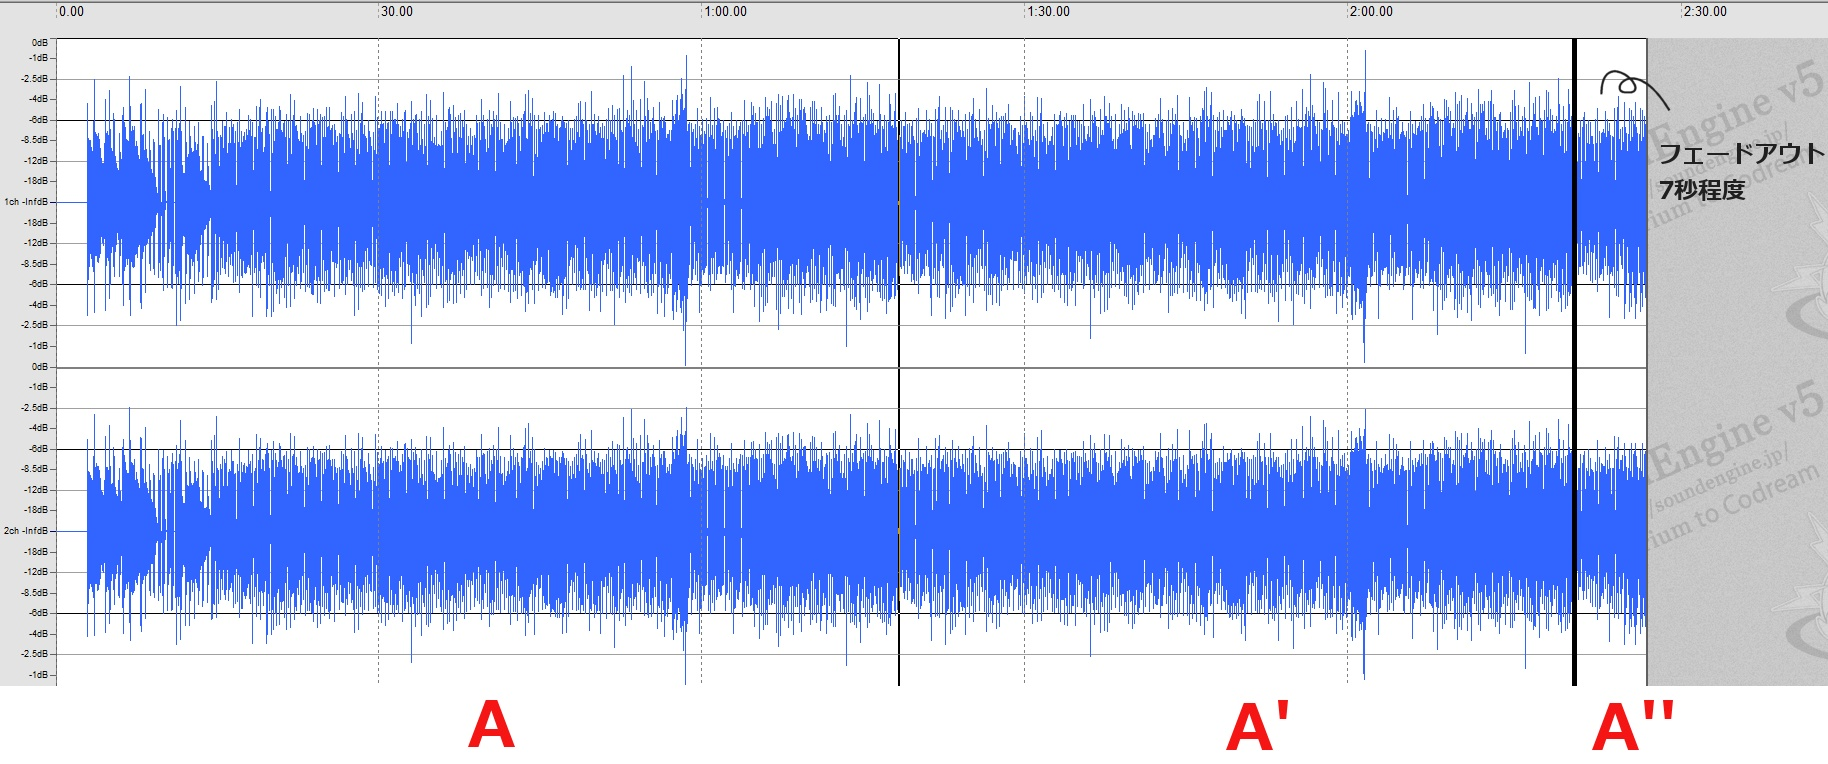 recording_012.jpg